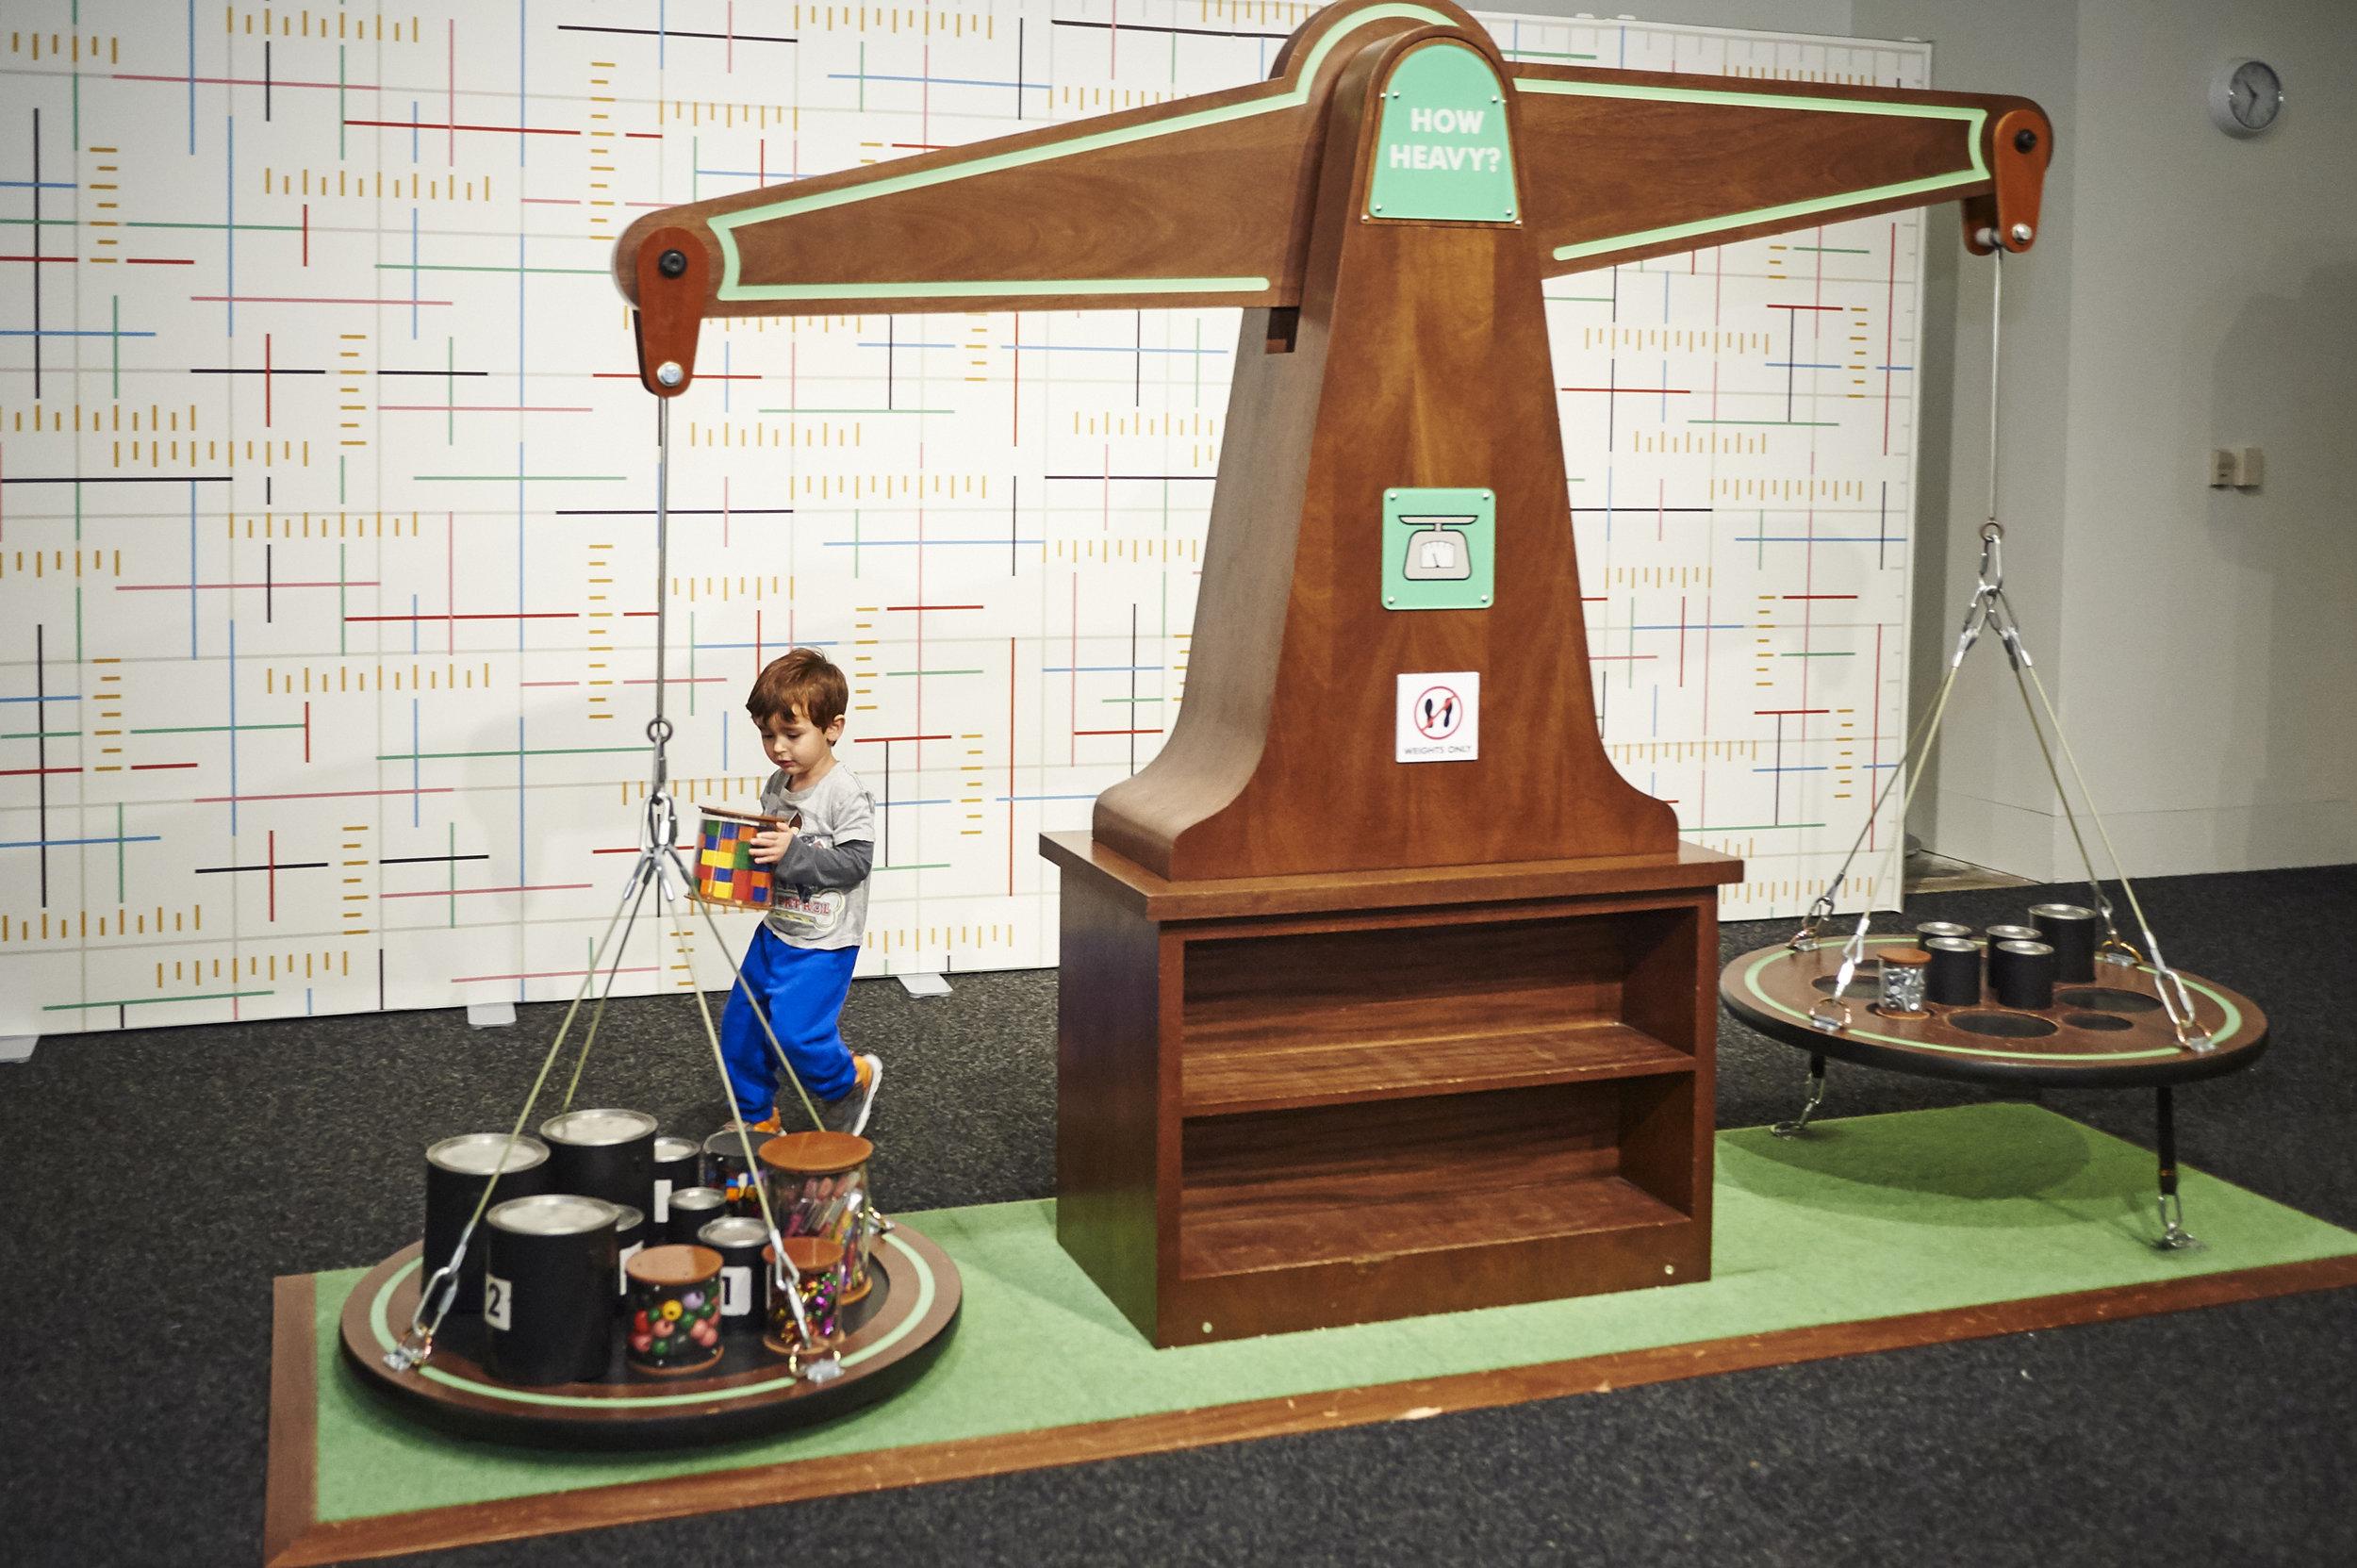 170417_ChildrensMuseum_Measure_110.jpg